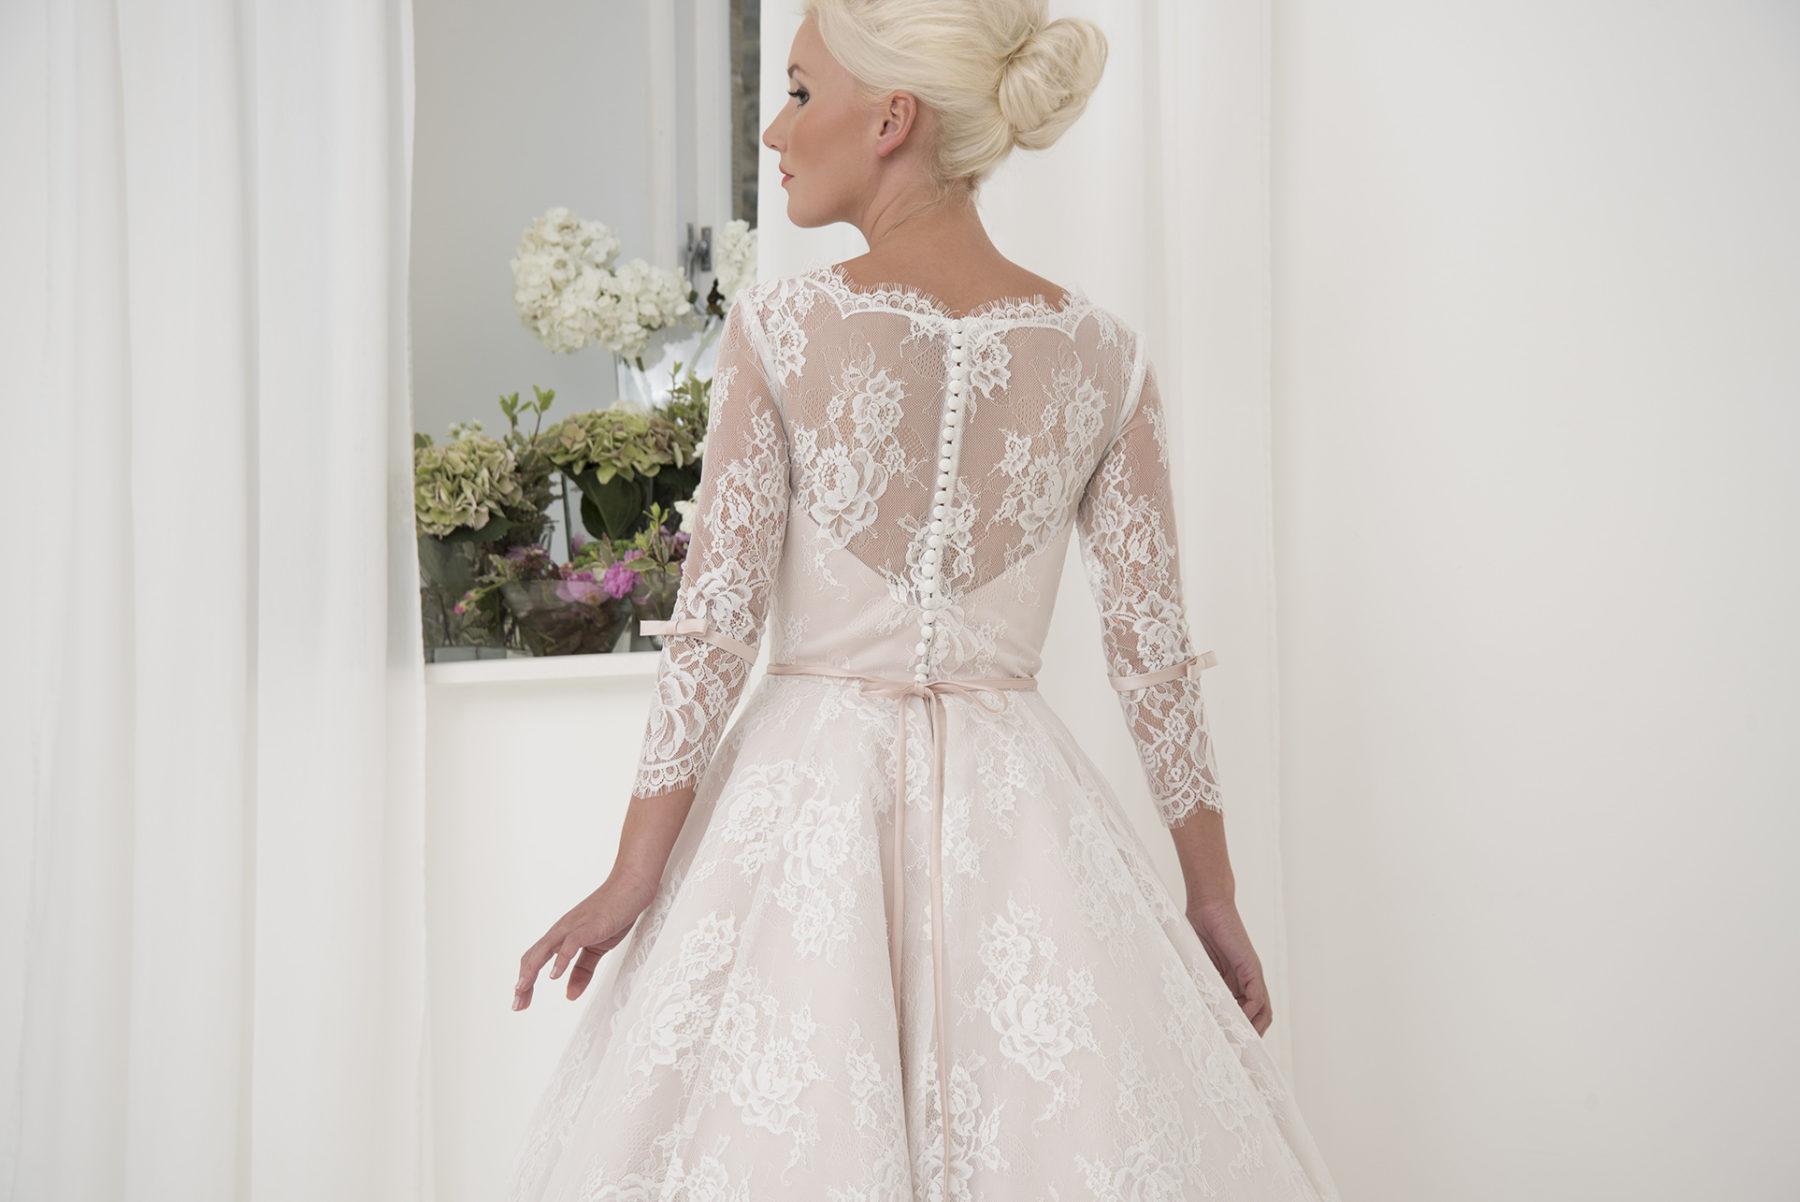 exquisite wedding gown detailing